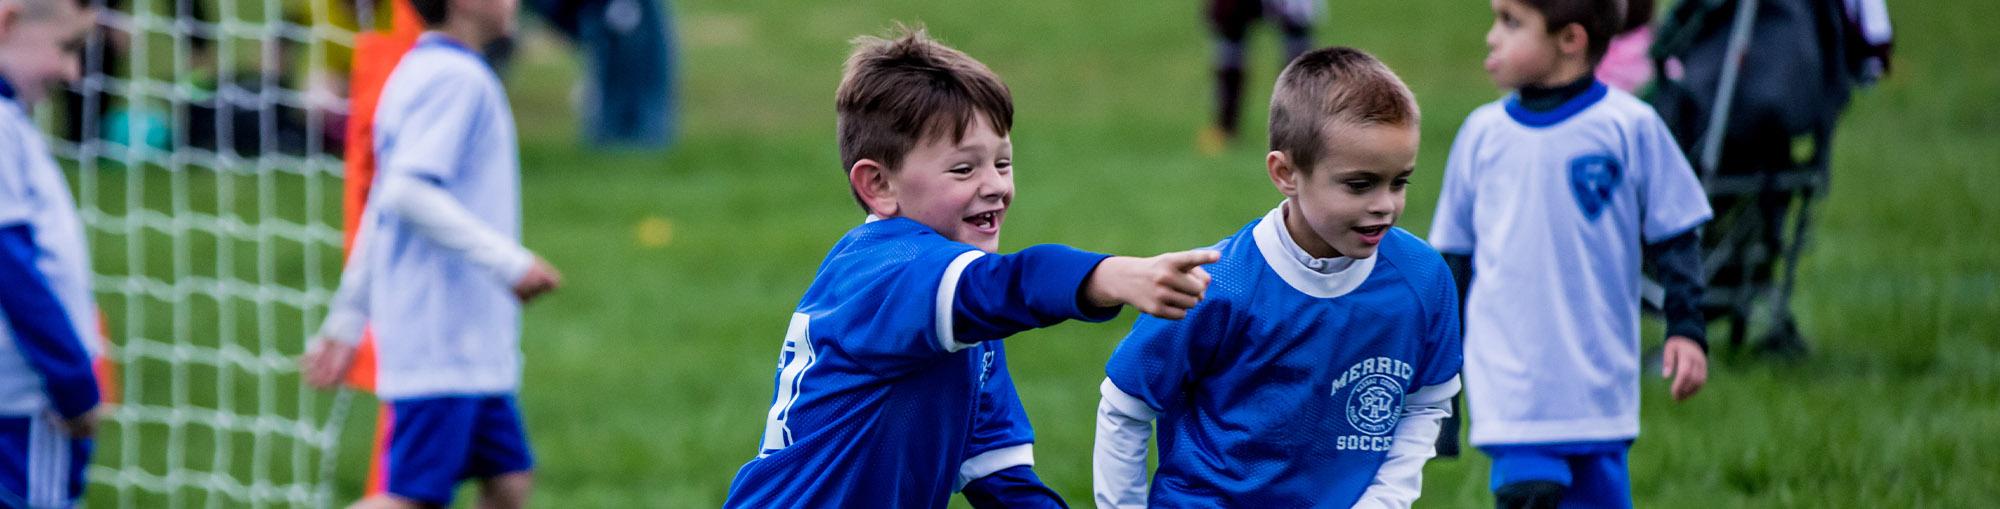 Boys Celebrating Goal